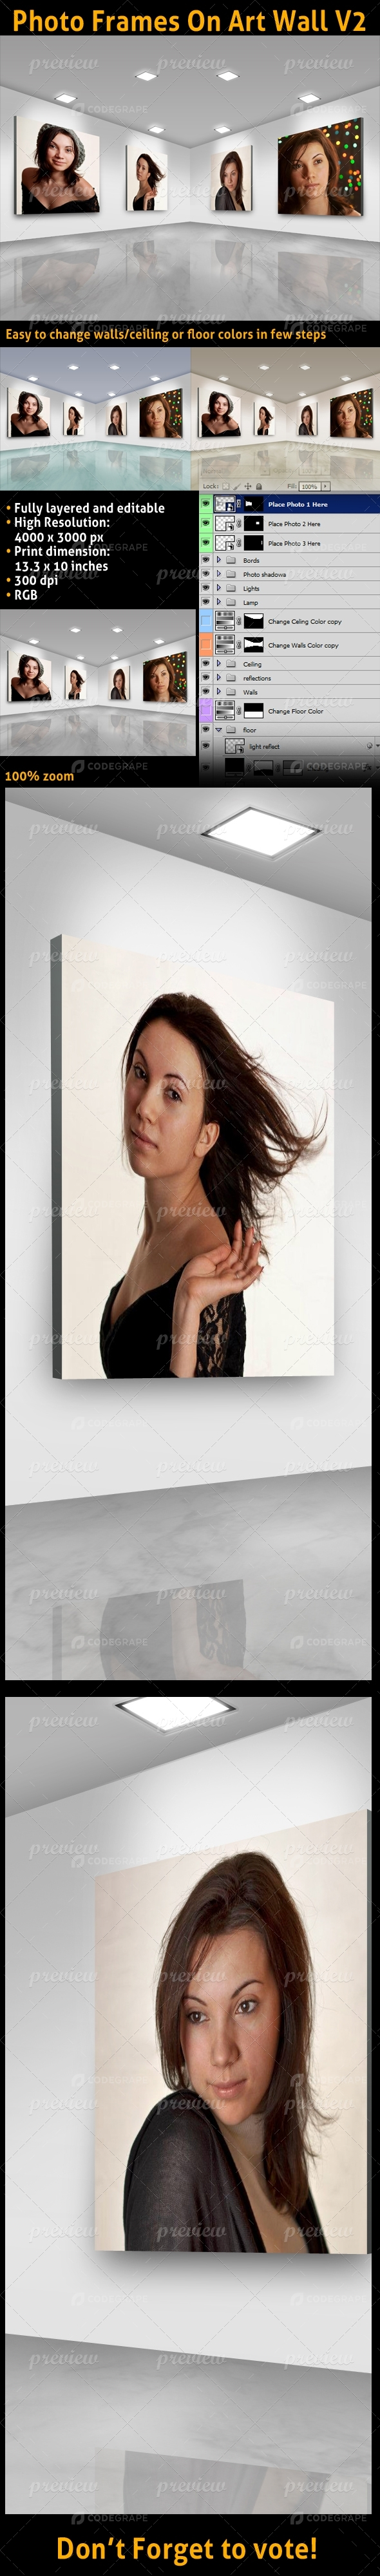 Photo Frames On Art Wall V2